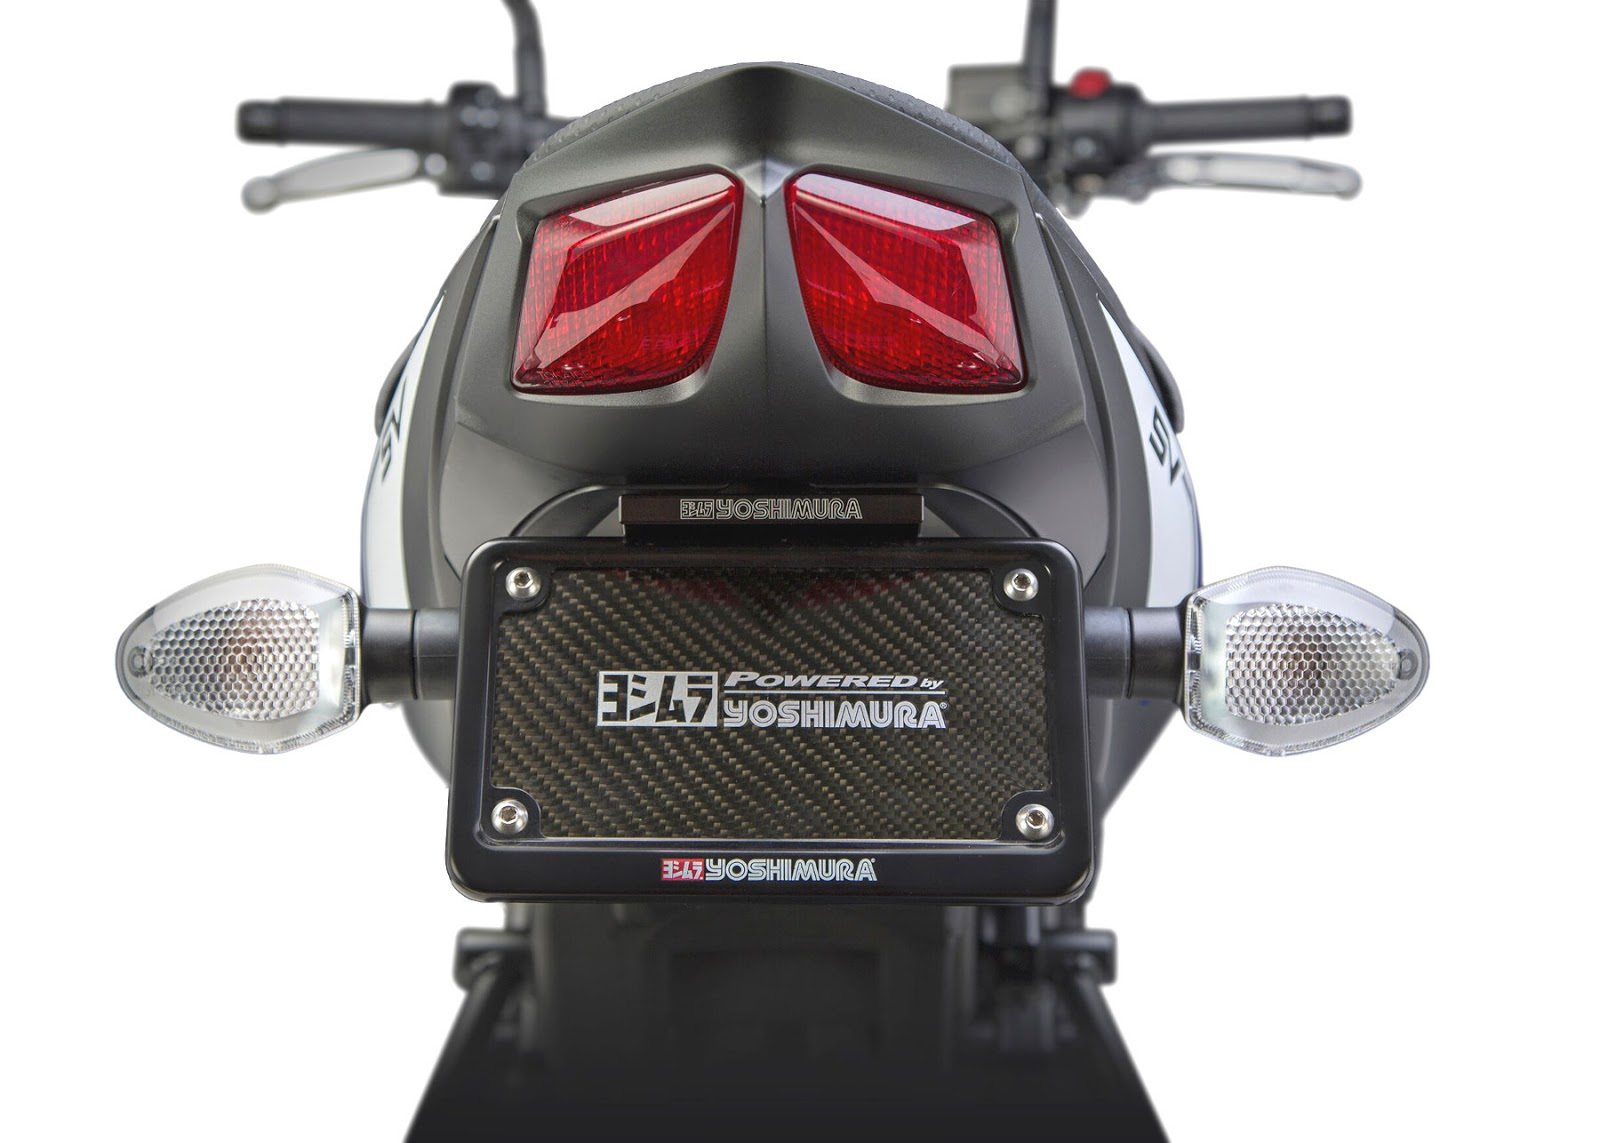 2017+Suzuki+SV650+rear+light+image.jpg